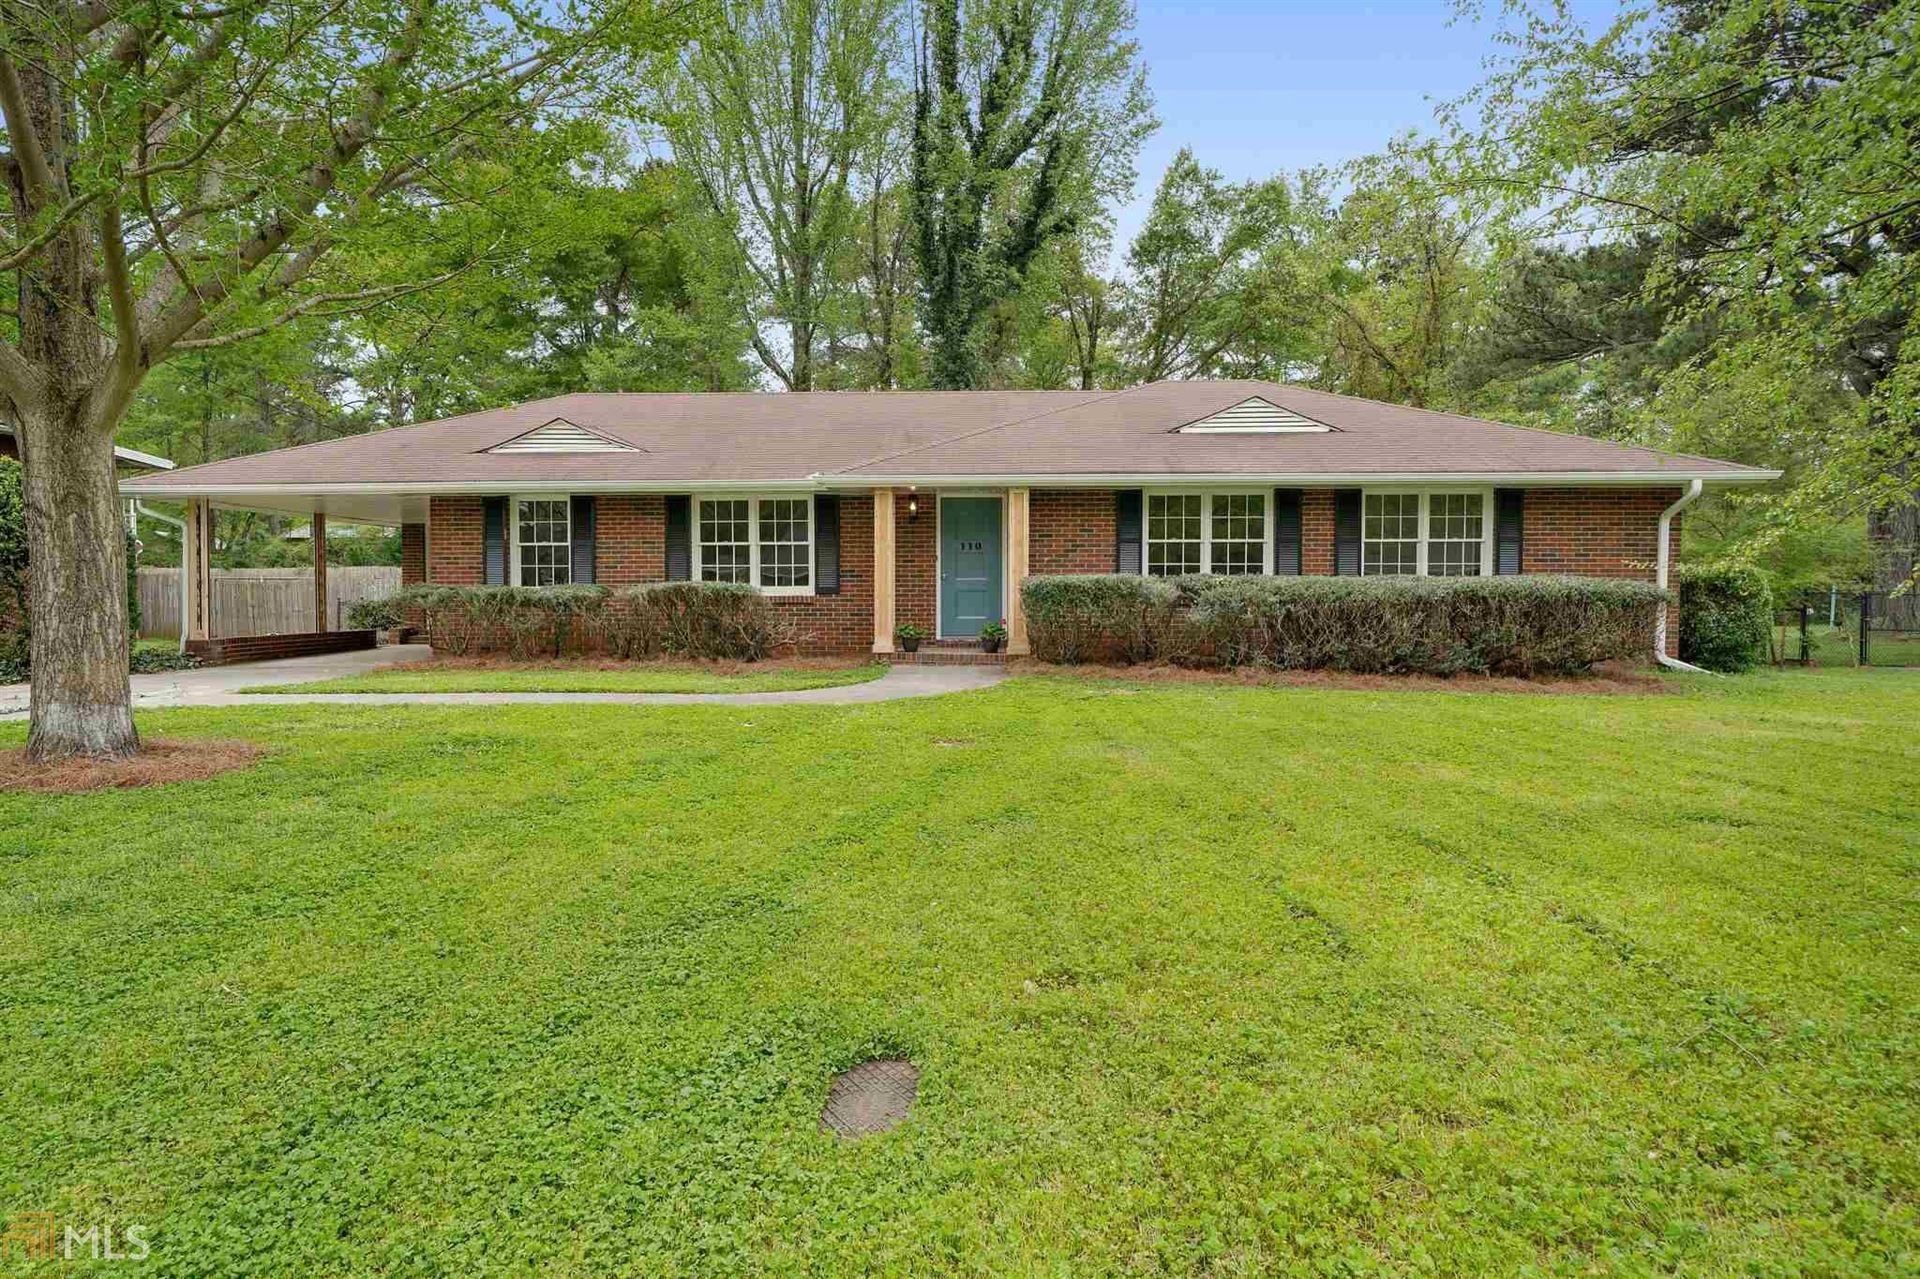 110 Davis Dr, Cartersville, GA 30120 - #: 8961655